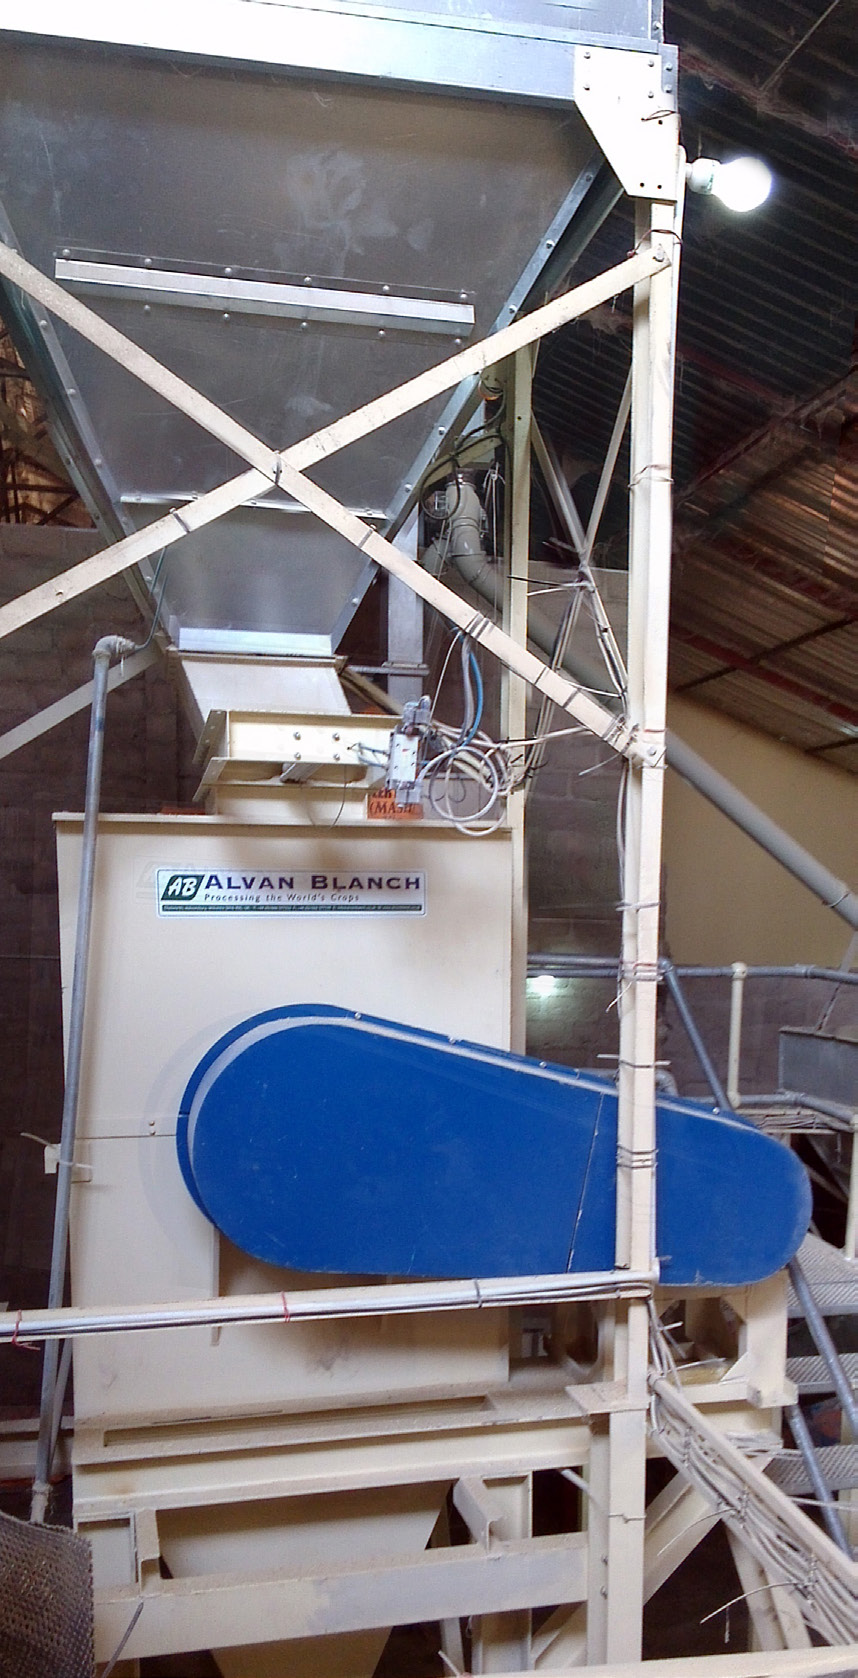 Alvan Blanch Feedmill with Pelleting System Nazawara State Nigeria Page 1 Image 0001